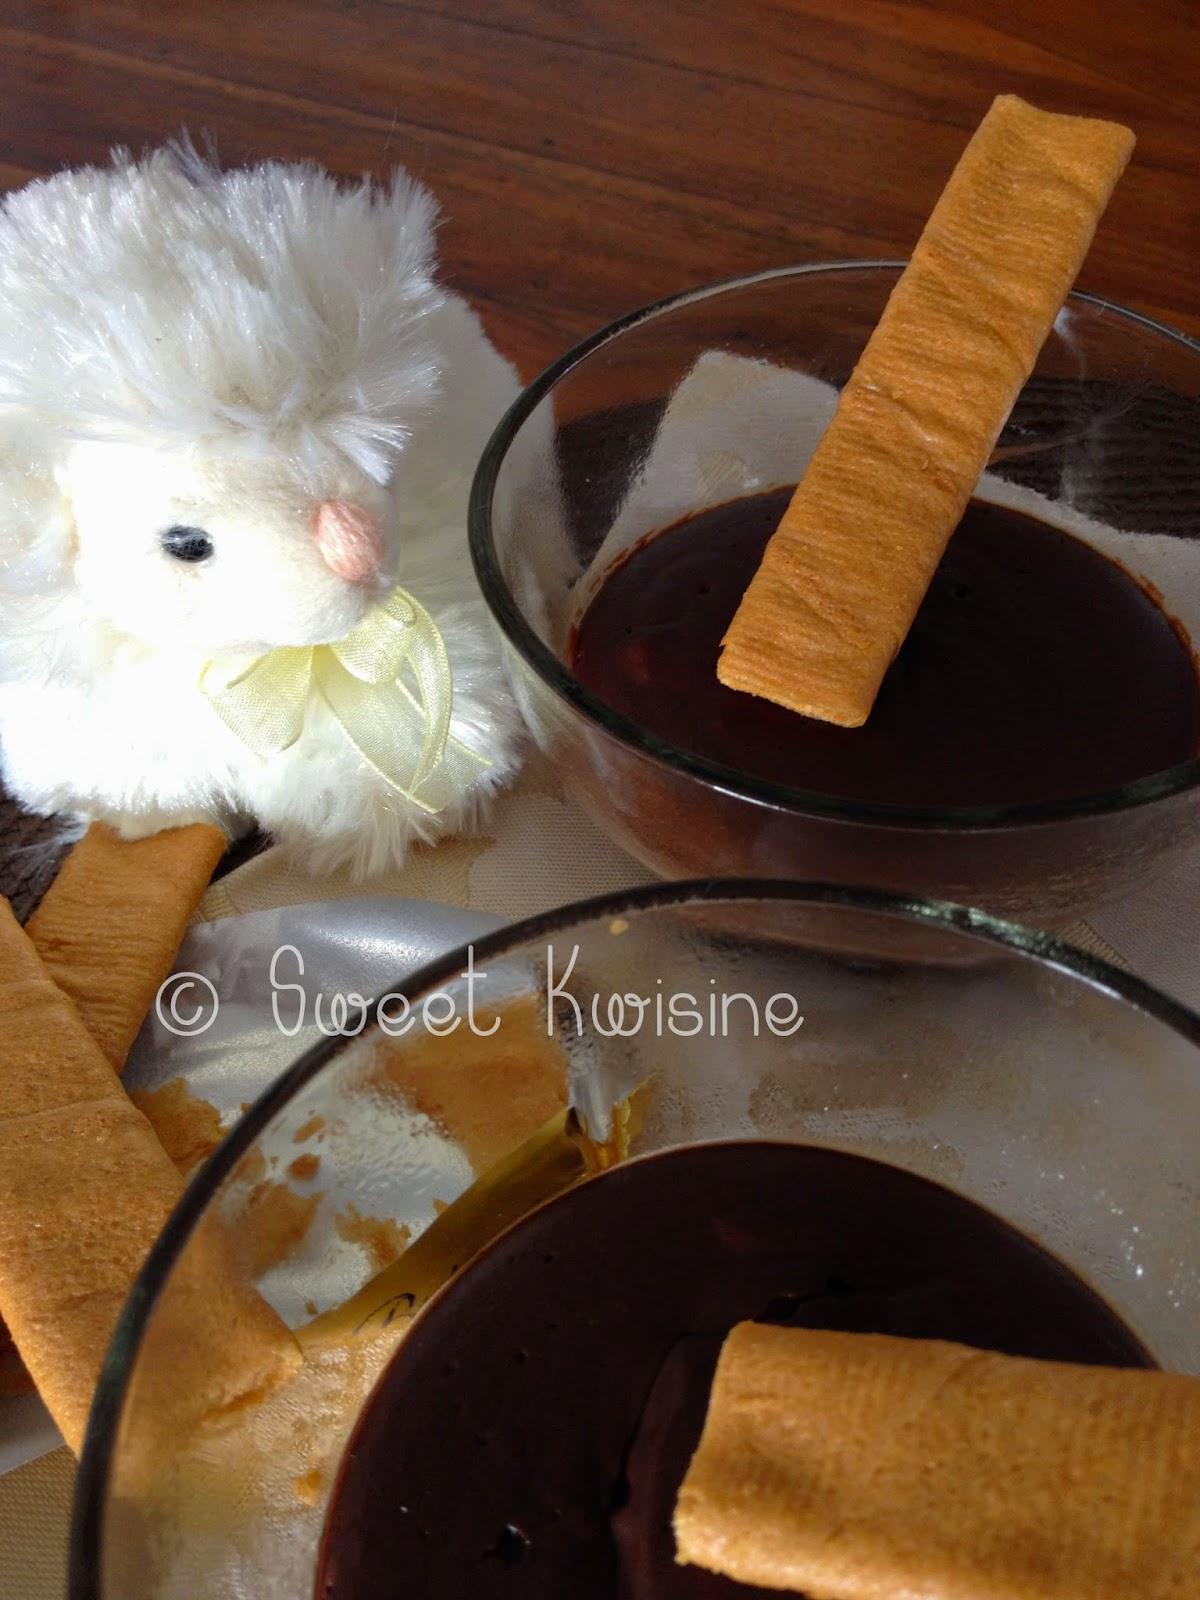 Sweet Kwisine, crème chocolat, sans oeuf, Danette, egg free, chocolate cream, dessert, cuisine facile